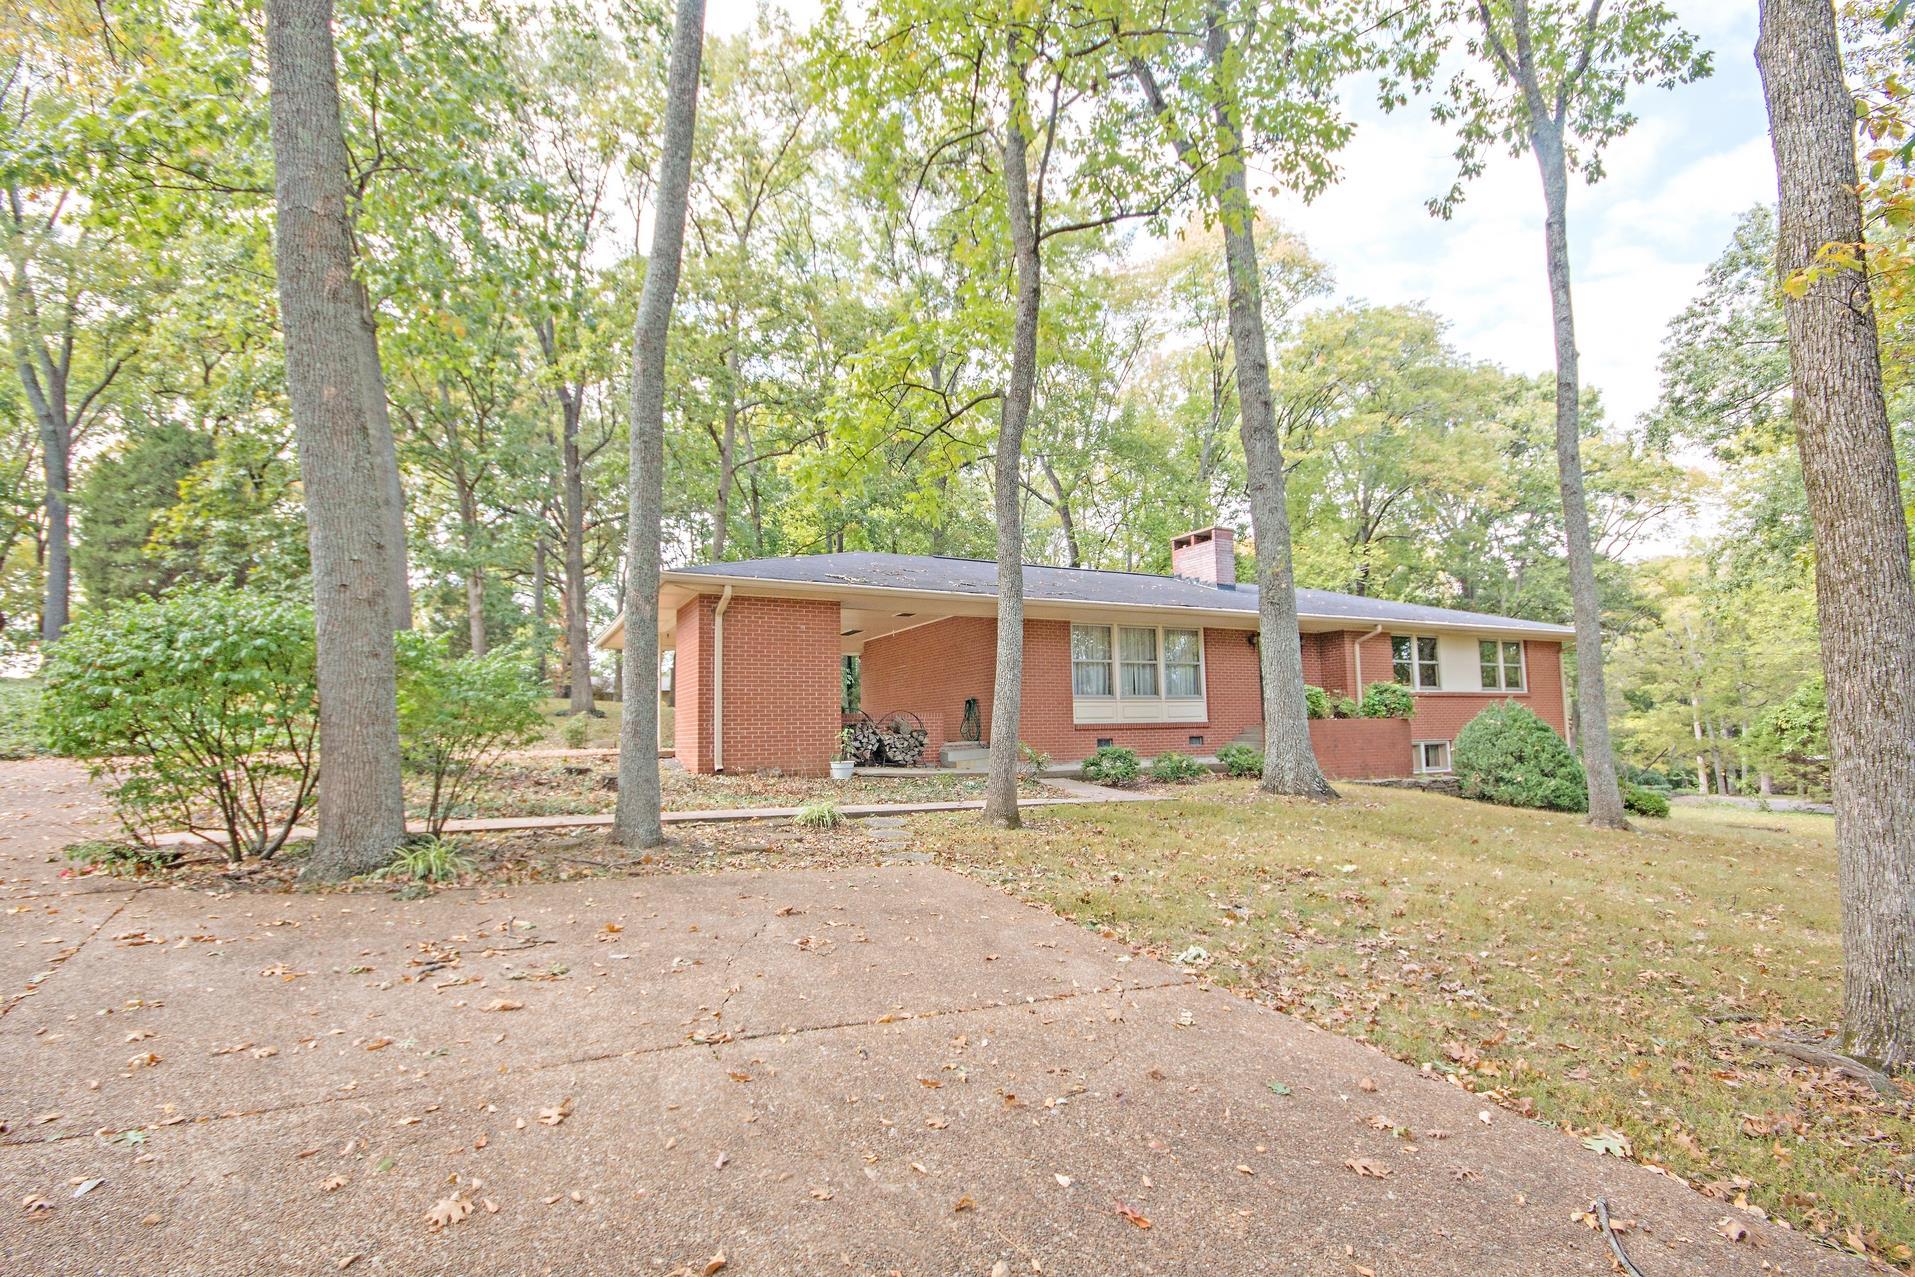 805 N Graycroft Avenue, Madison, TN, 37115 Primary Photo